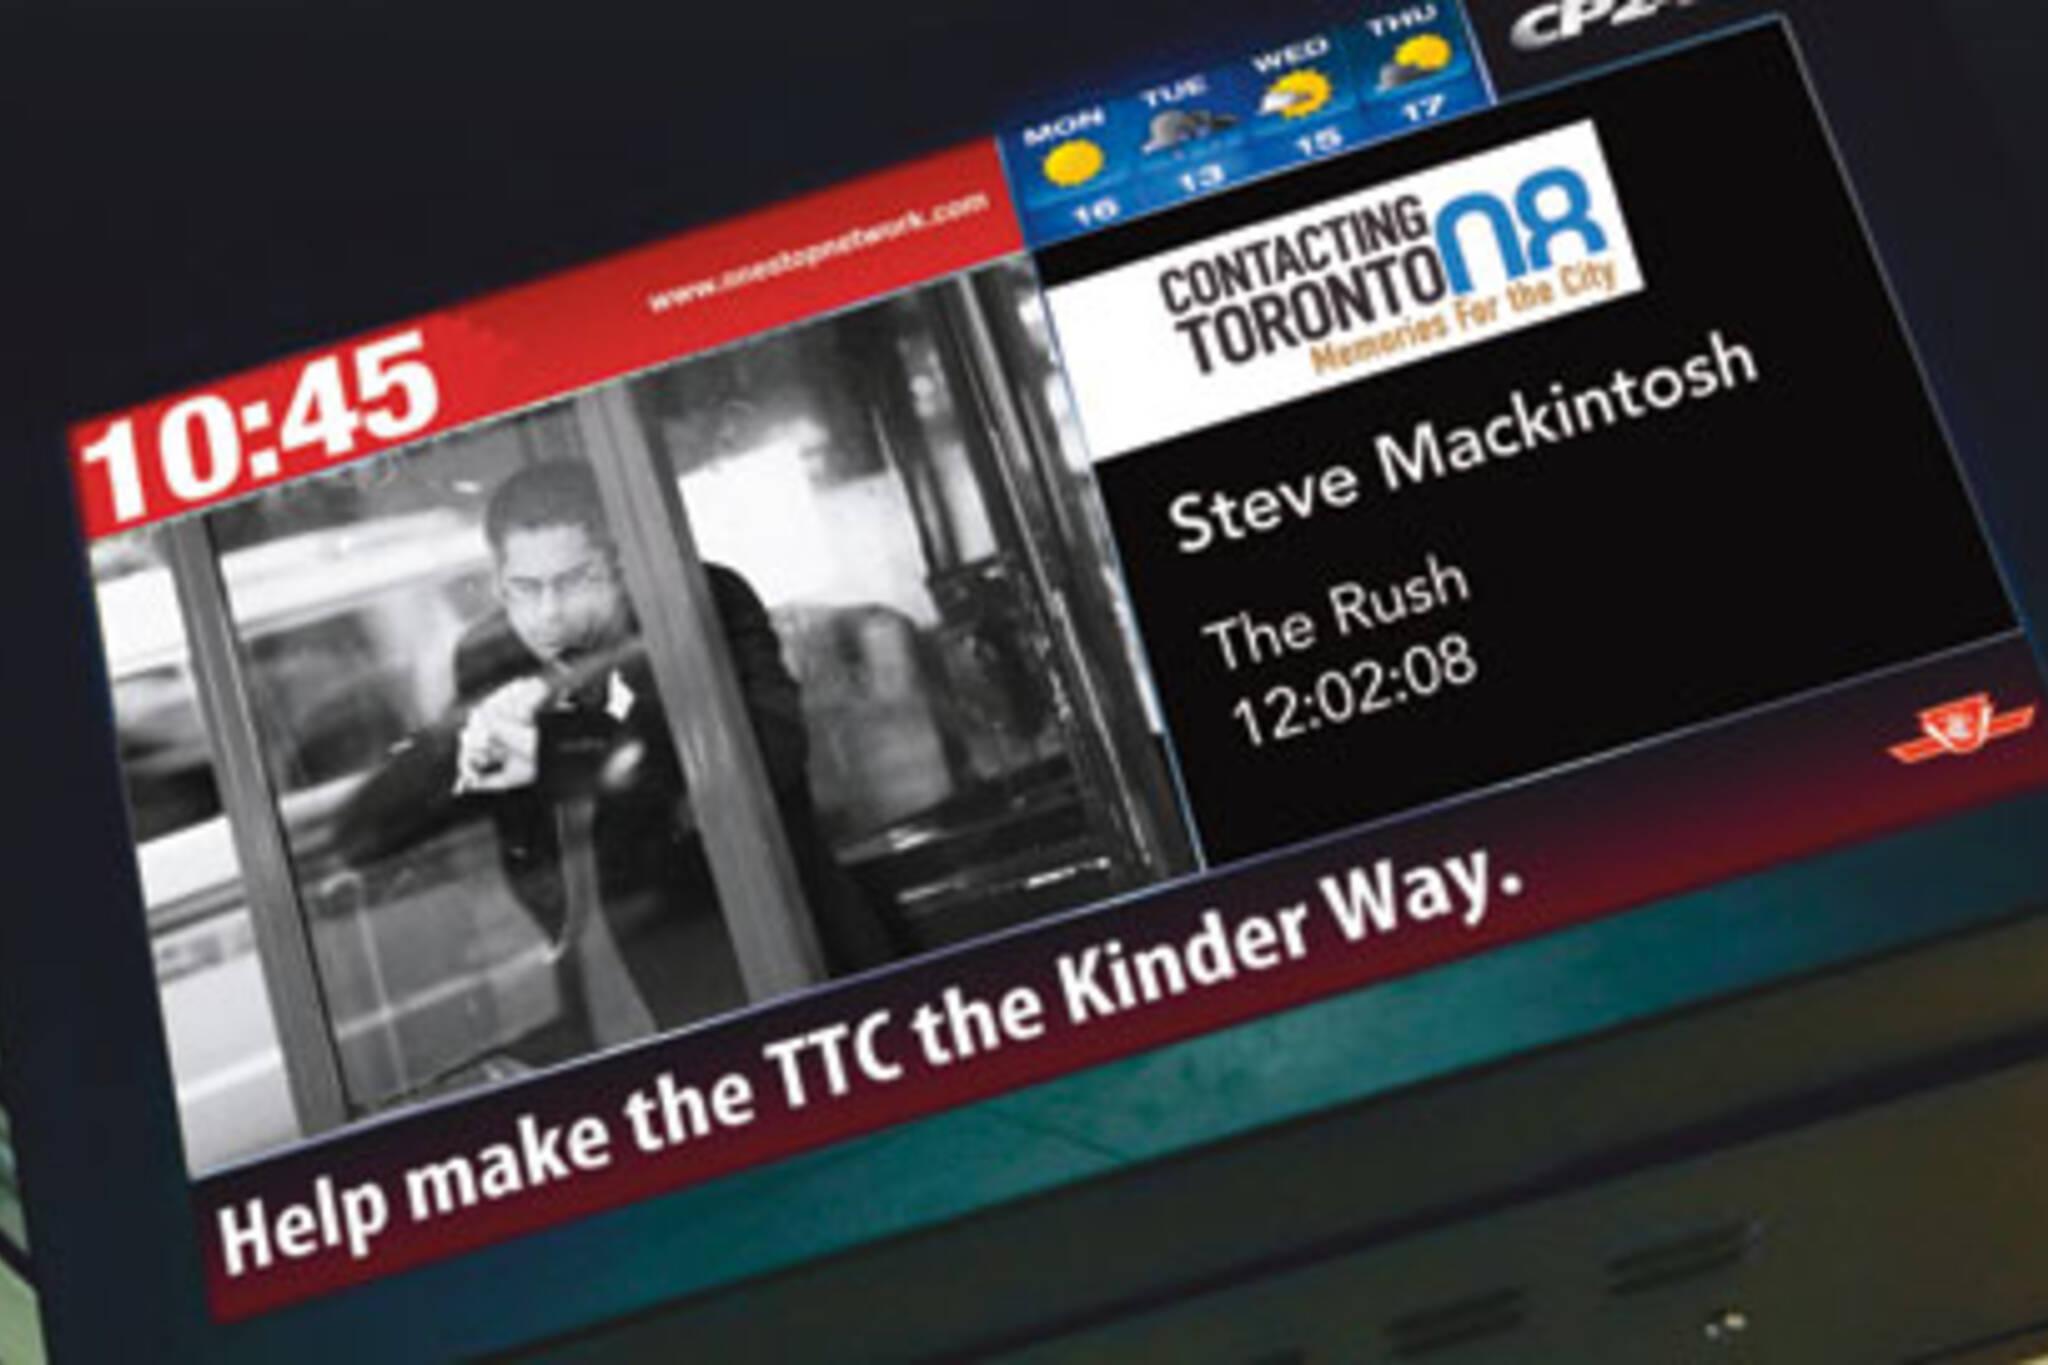 Contacting Toronto